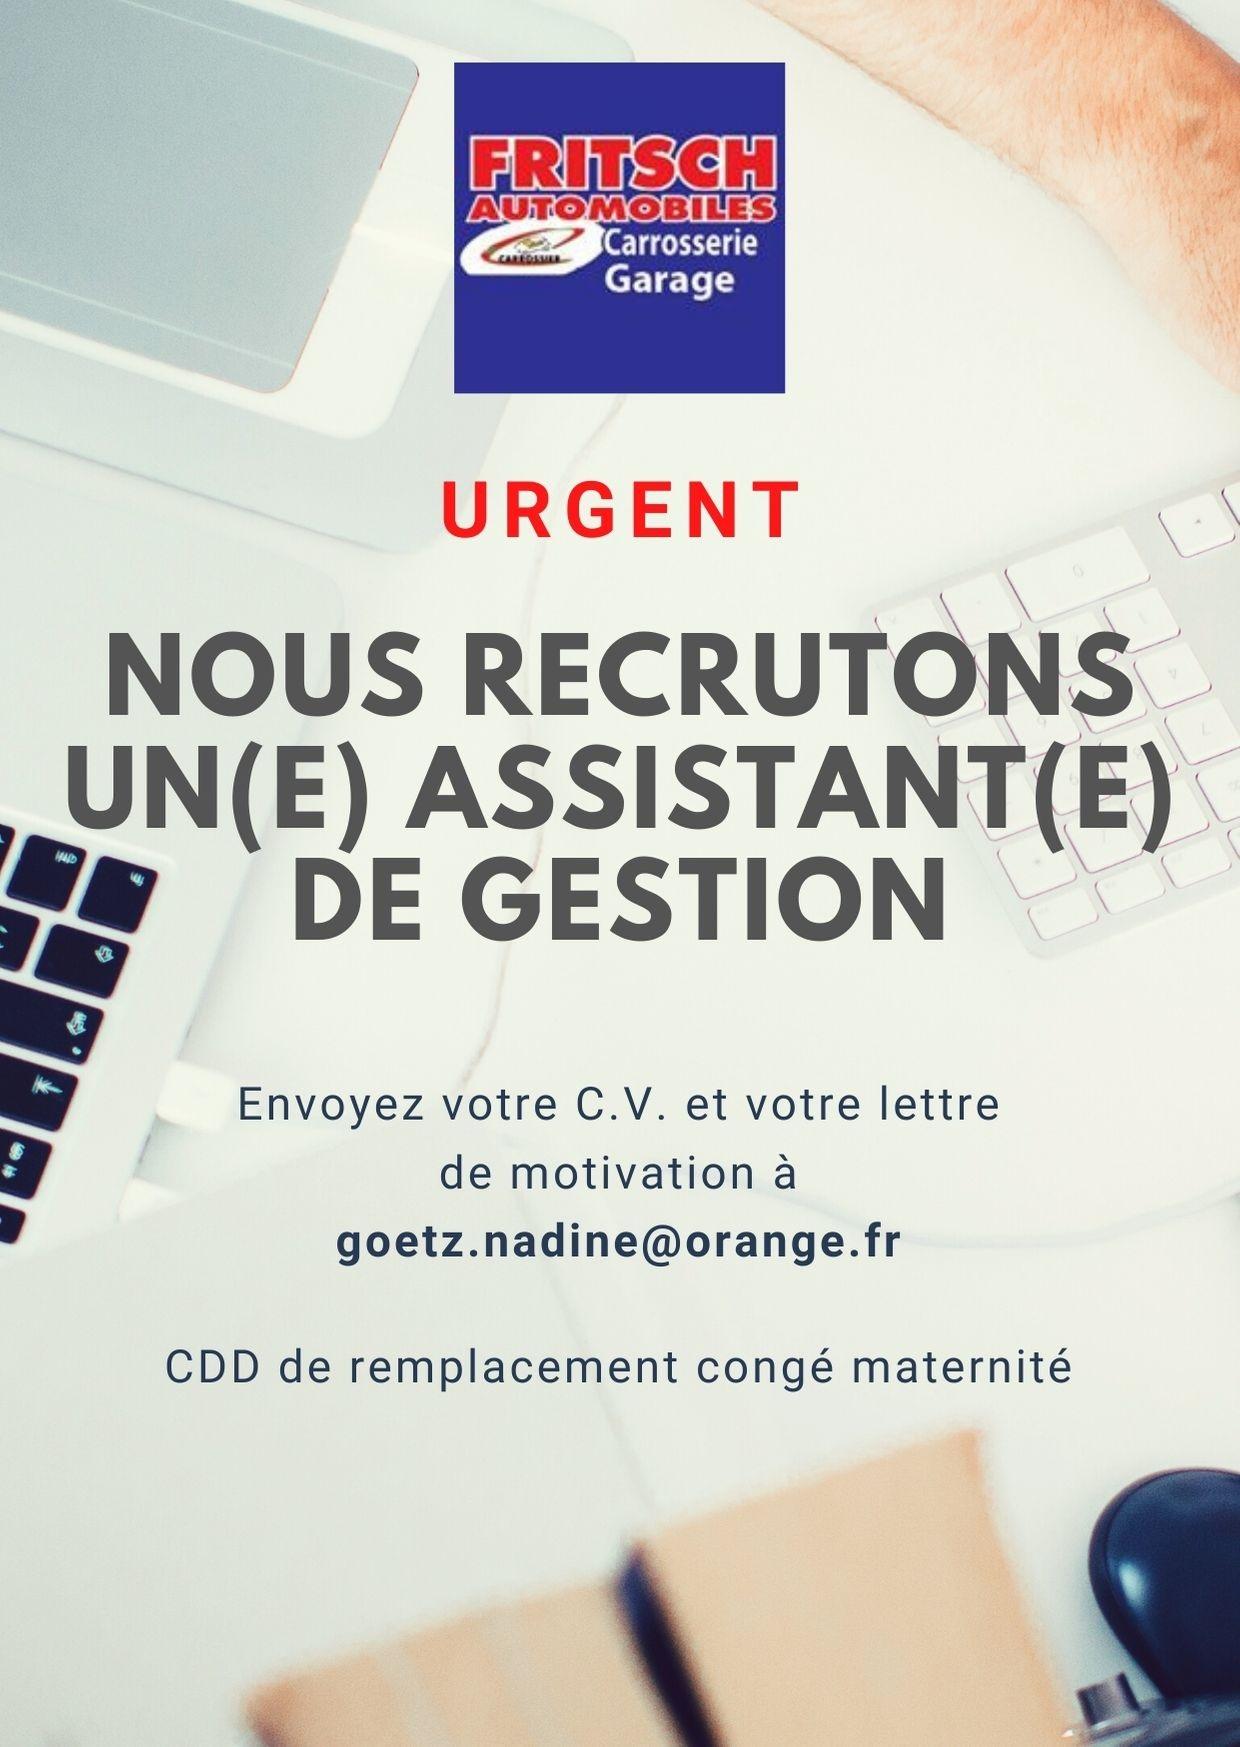 Recrutement_urgent_Automobiles_Fritsch